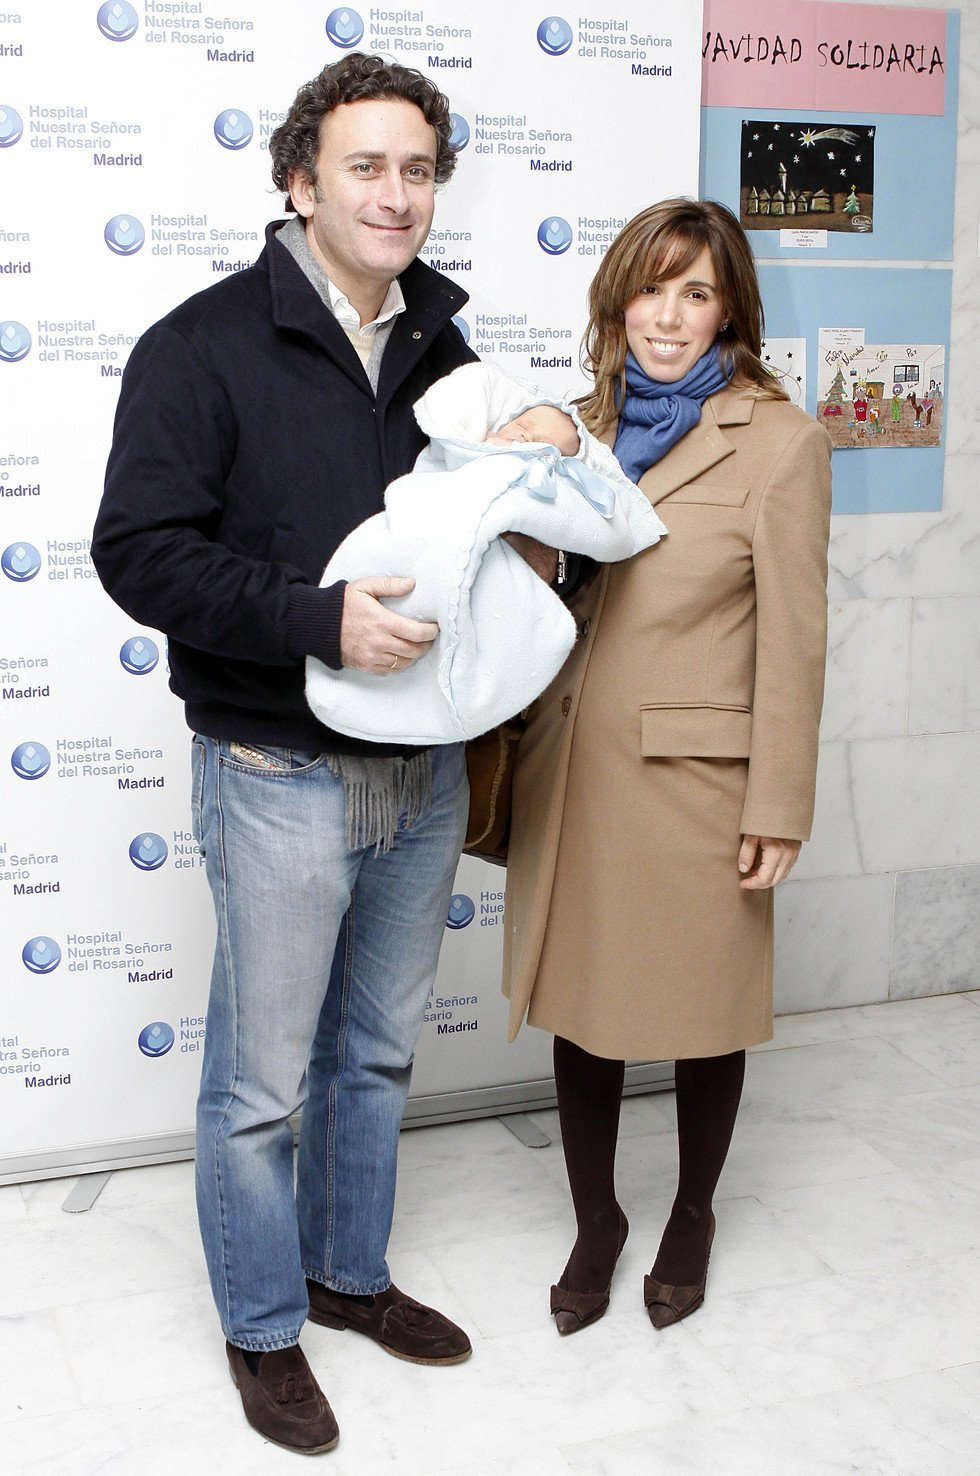 Ana Aznar y Alejandro Agag presentan a su bebé Alonso